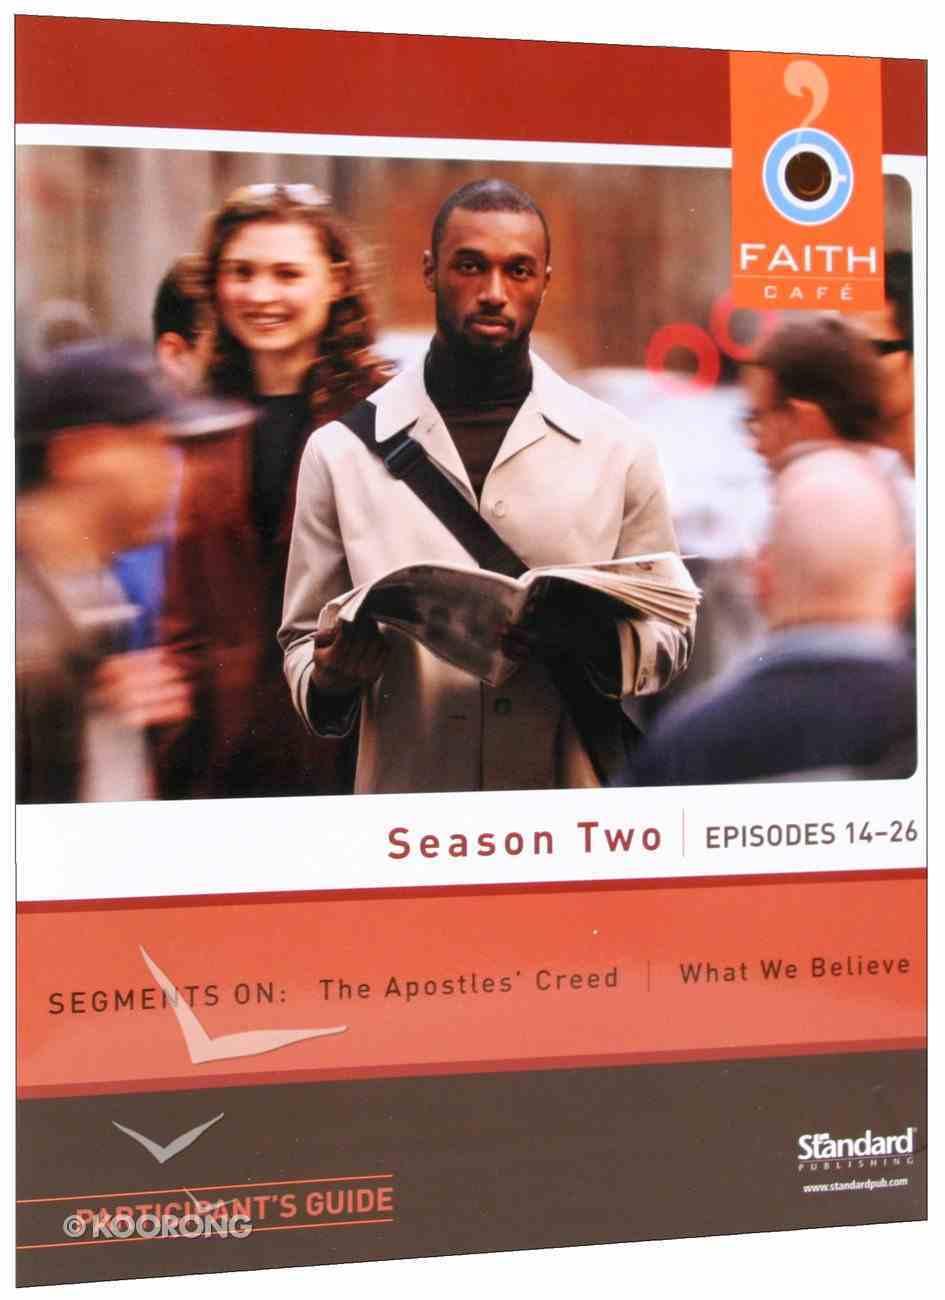 Faith Cafe: Season Two Episodes 14-26 (Participant's Guide) Paperback